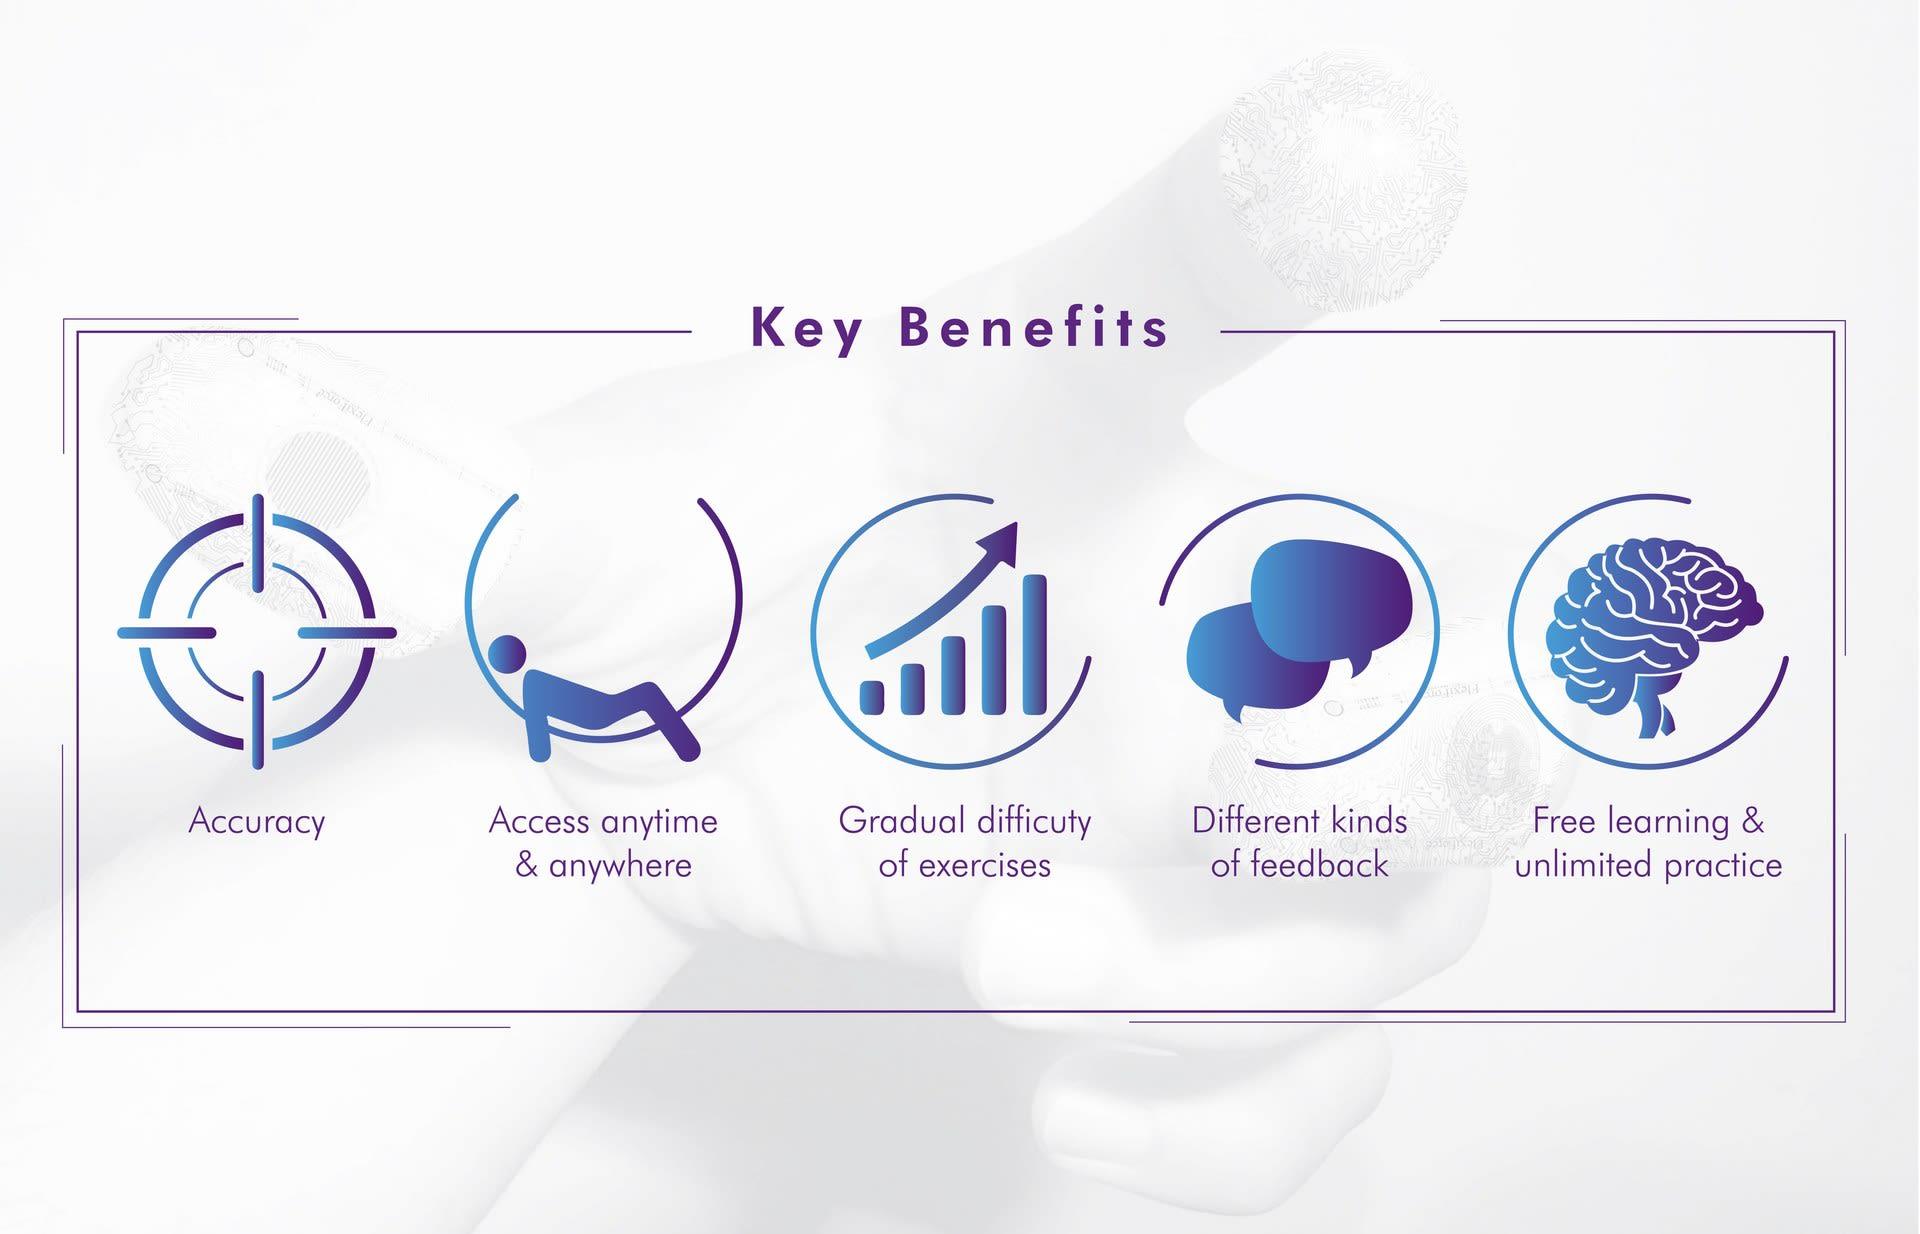 _Key benefits